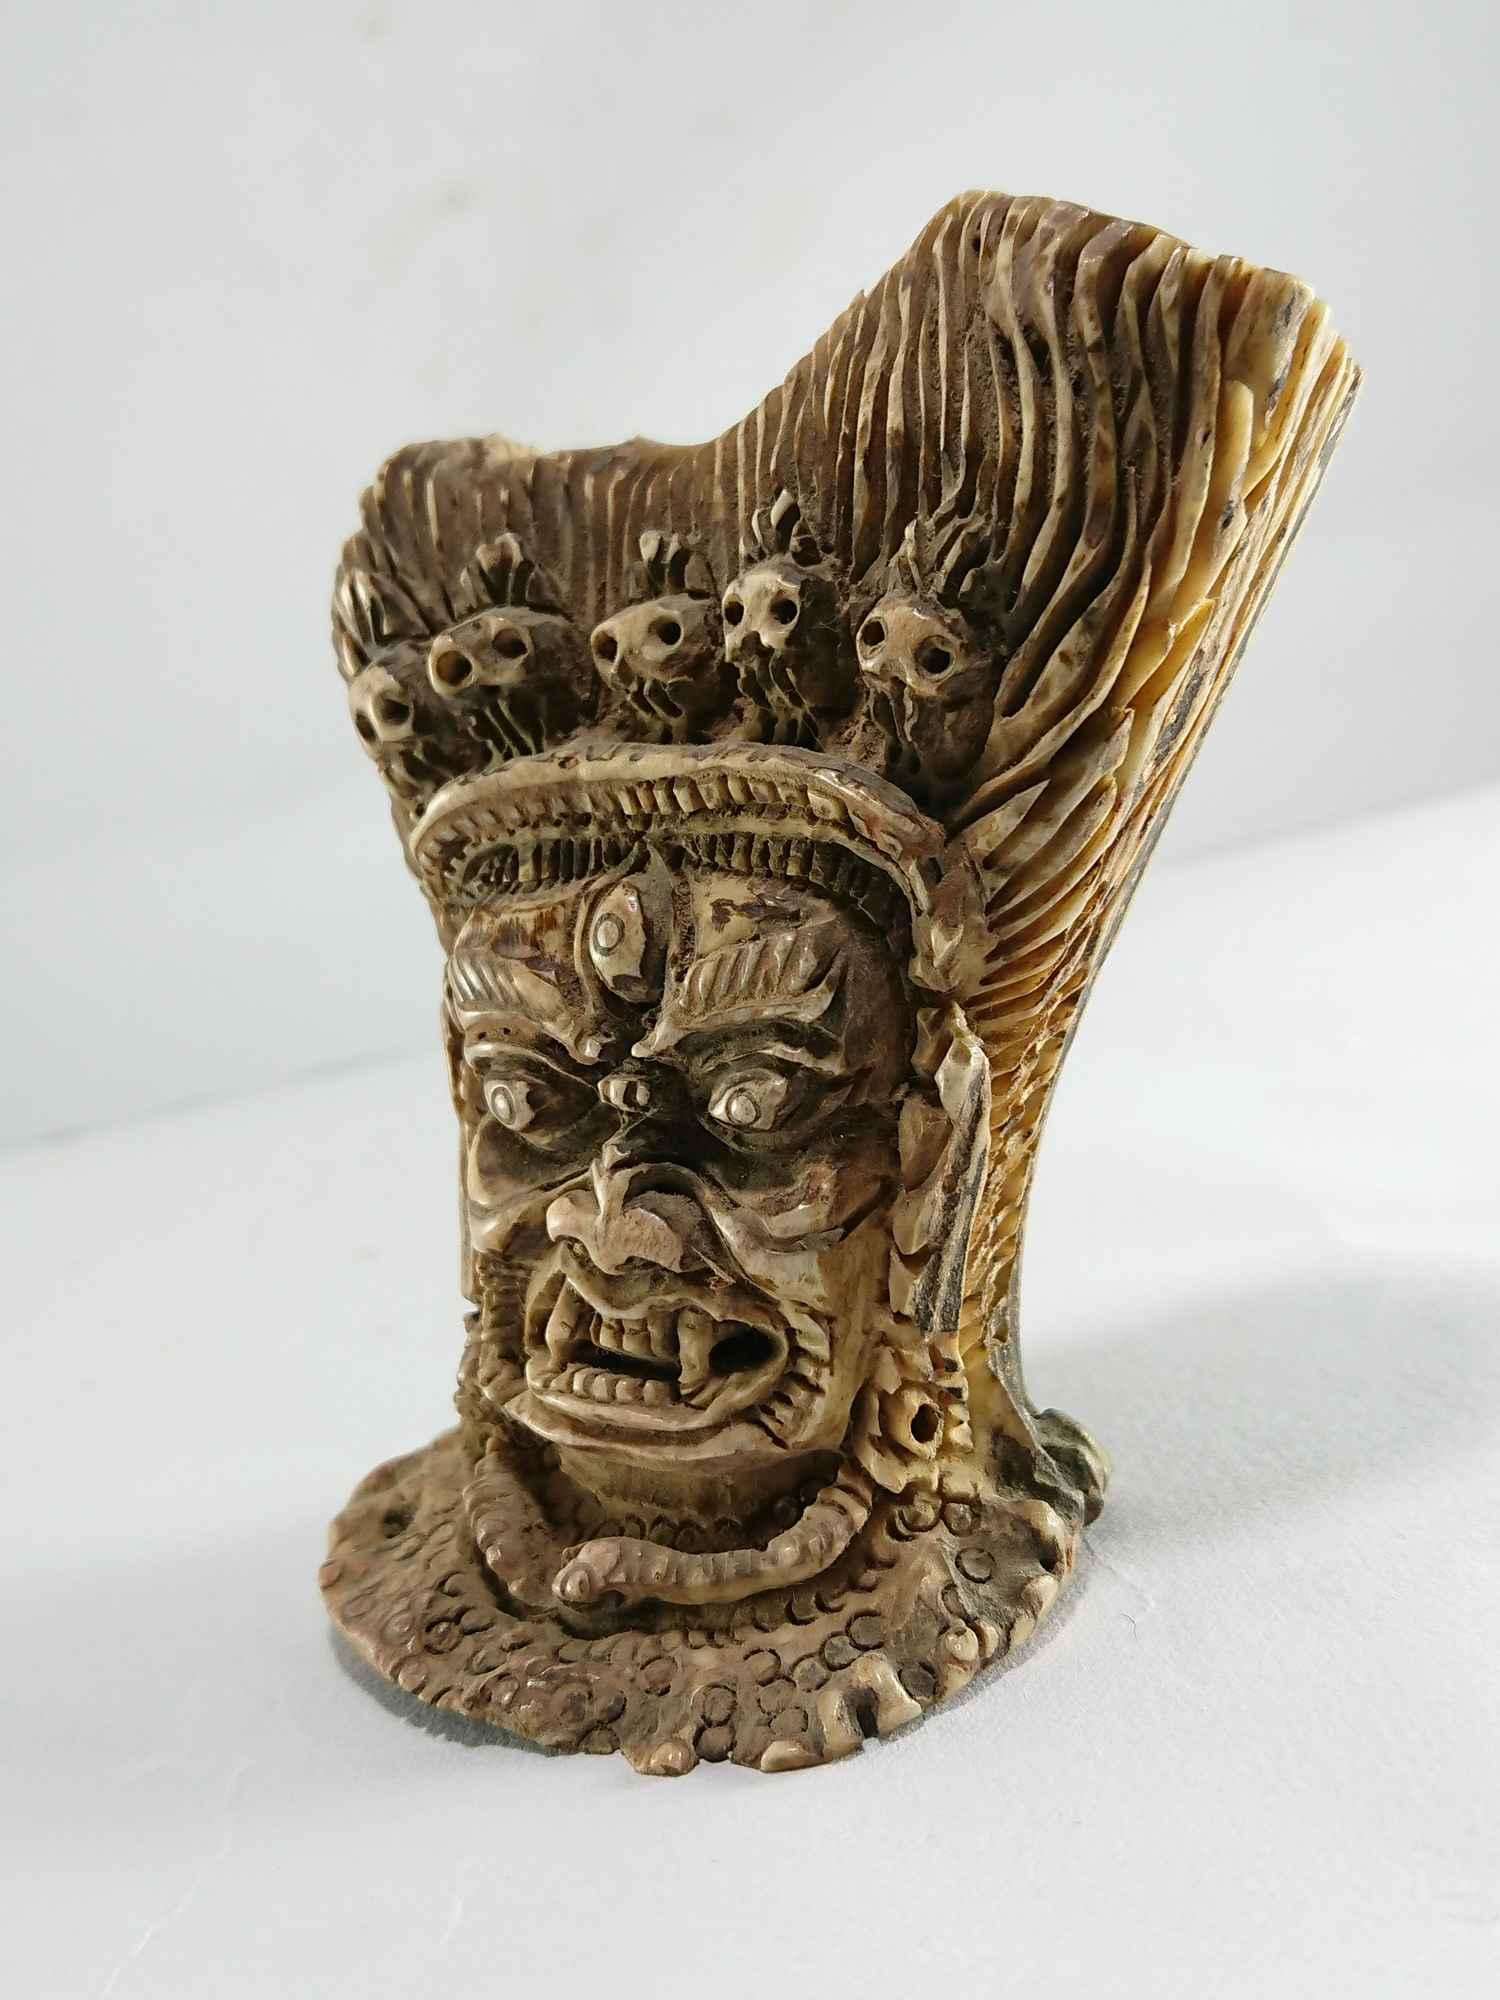 Buddhist Ritual Objects Rare Tibet Tantra Old Cattle Bone Carved Mahakala Head Usd 70 Size 8 5x5 Cm Material Yak Bone